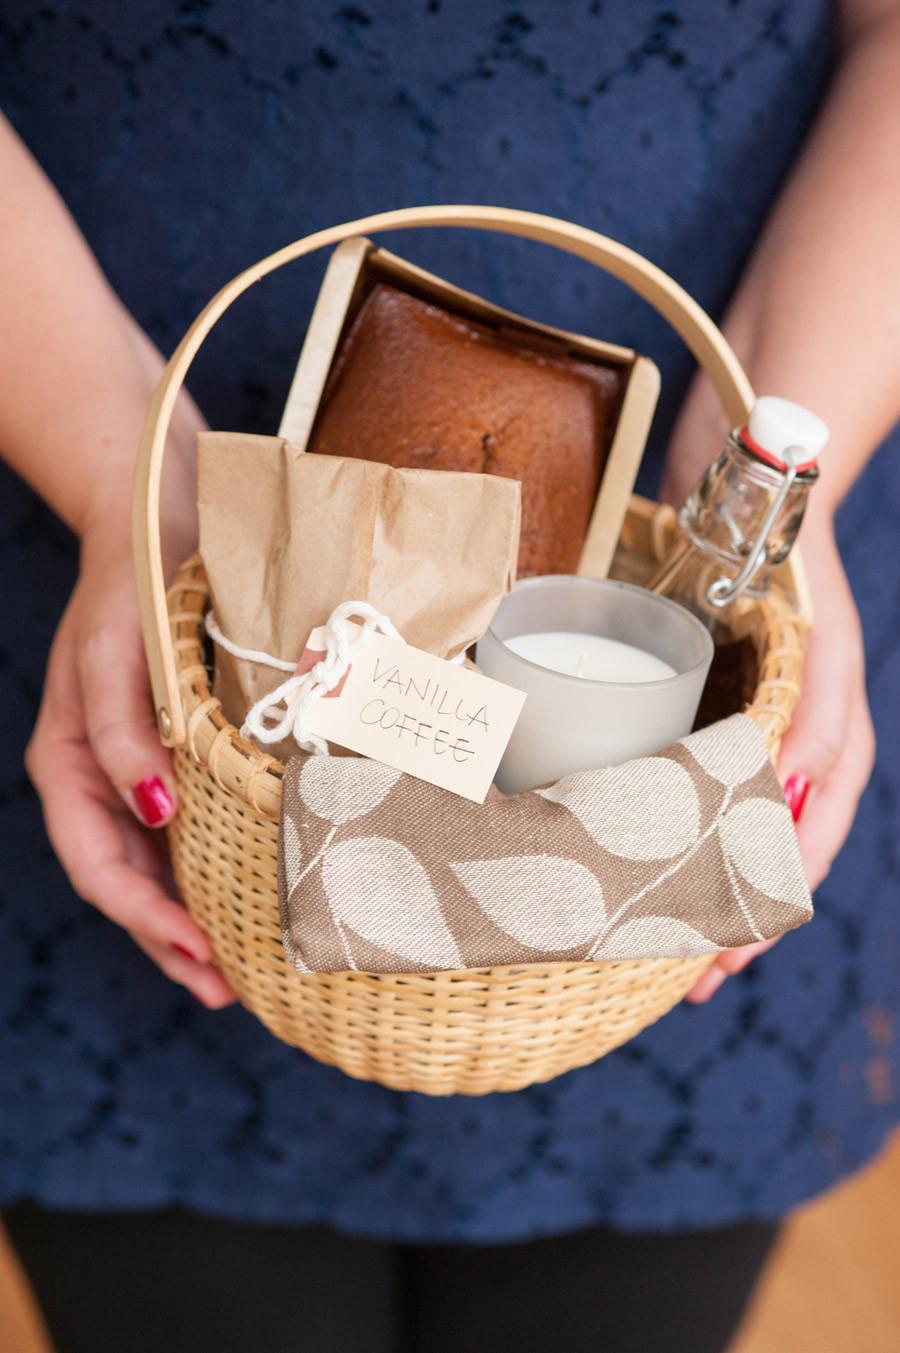 Diy Christmas Gift Baskets Ideas  9 Best s of DIY Christmas Gift Baskets DIY Gift